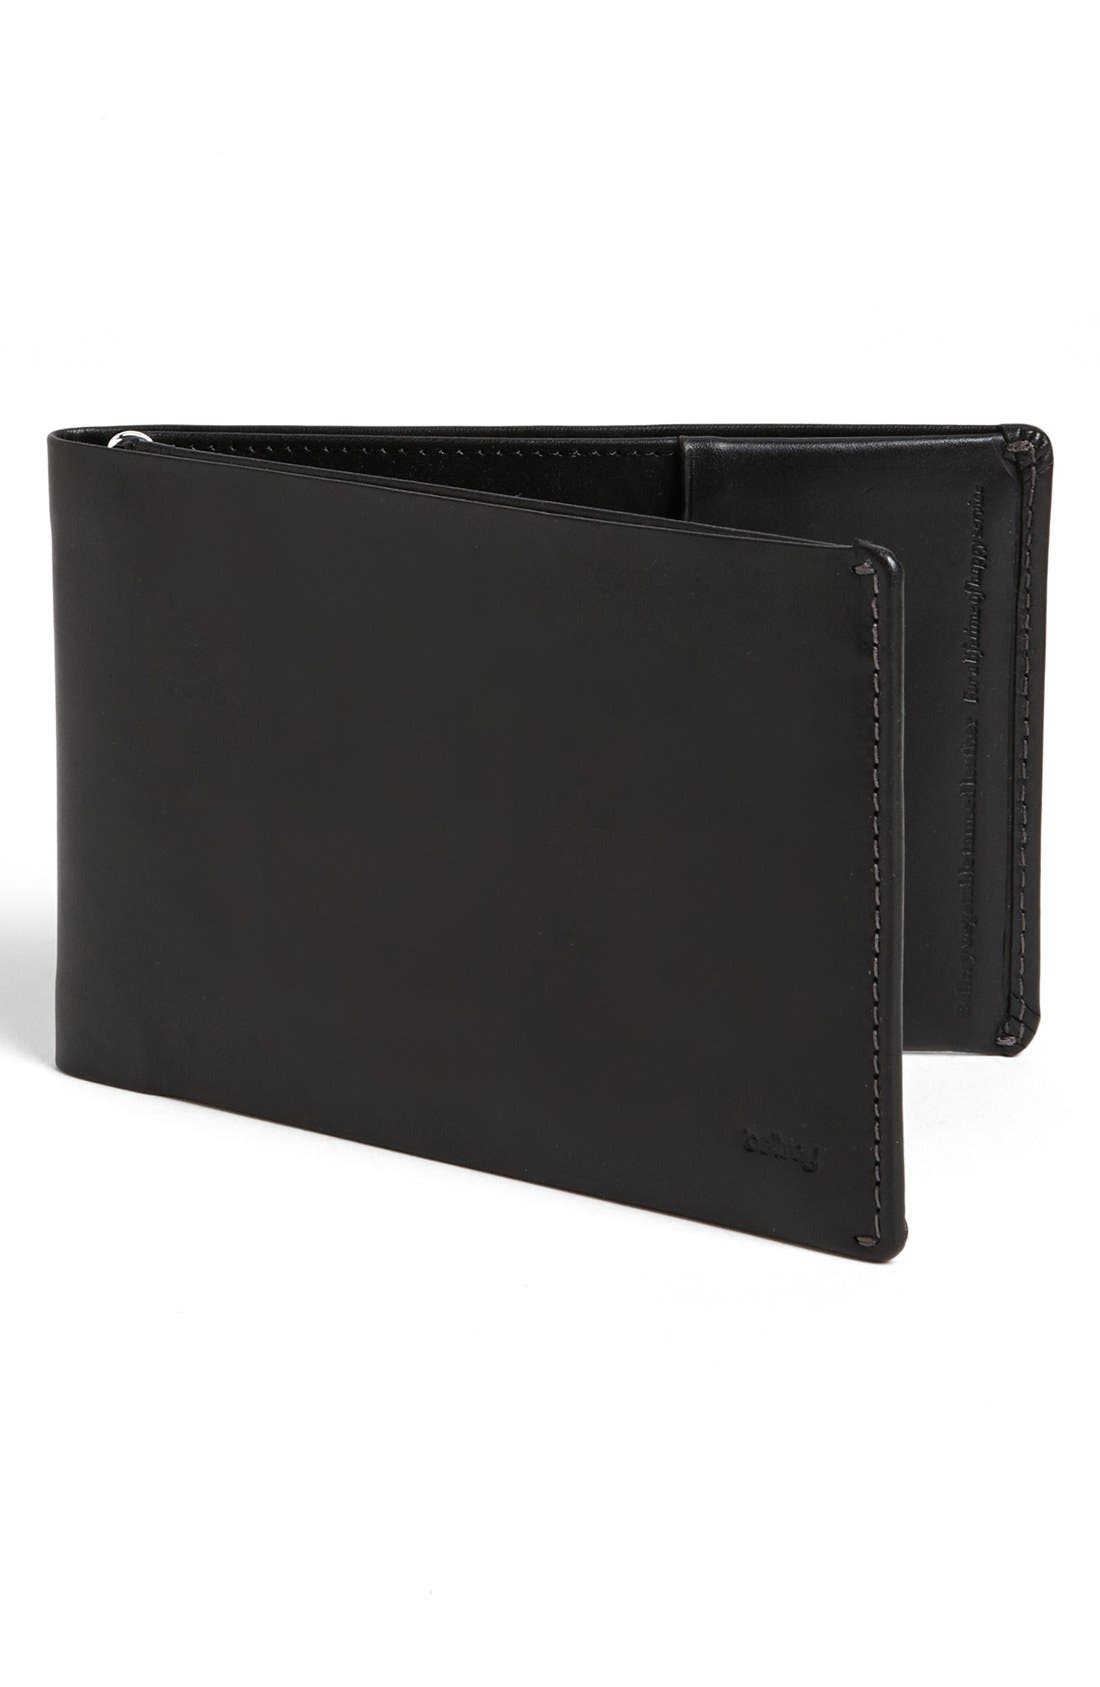 Main Image - Bellroy Travel Wallet